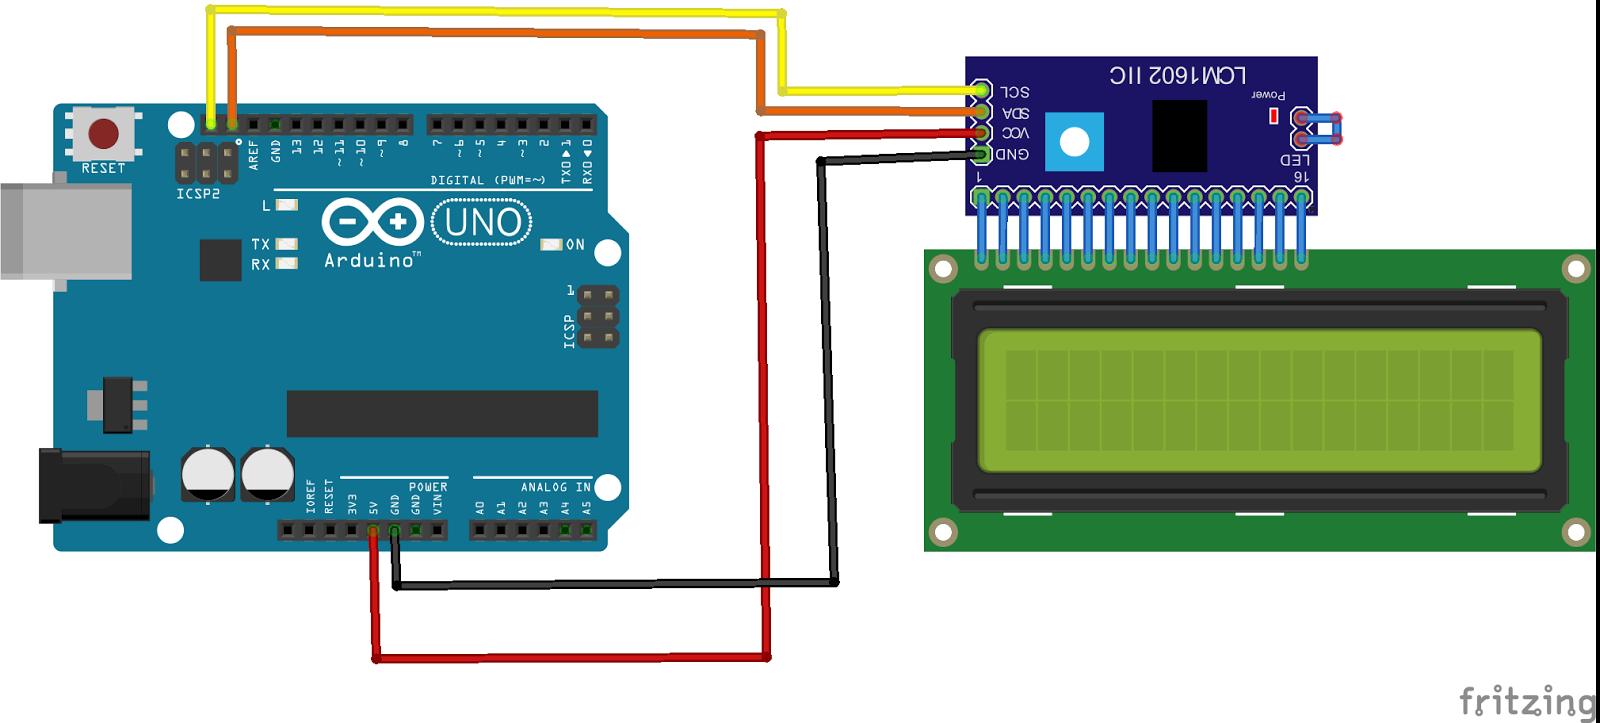 Lensa Coding: Program LCD i2C 16x2 Menggunakan Arduino